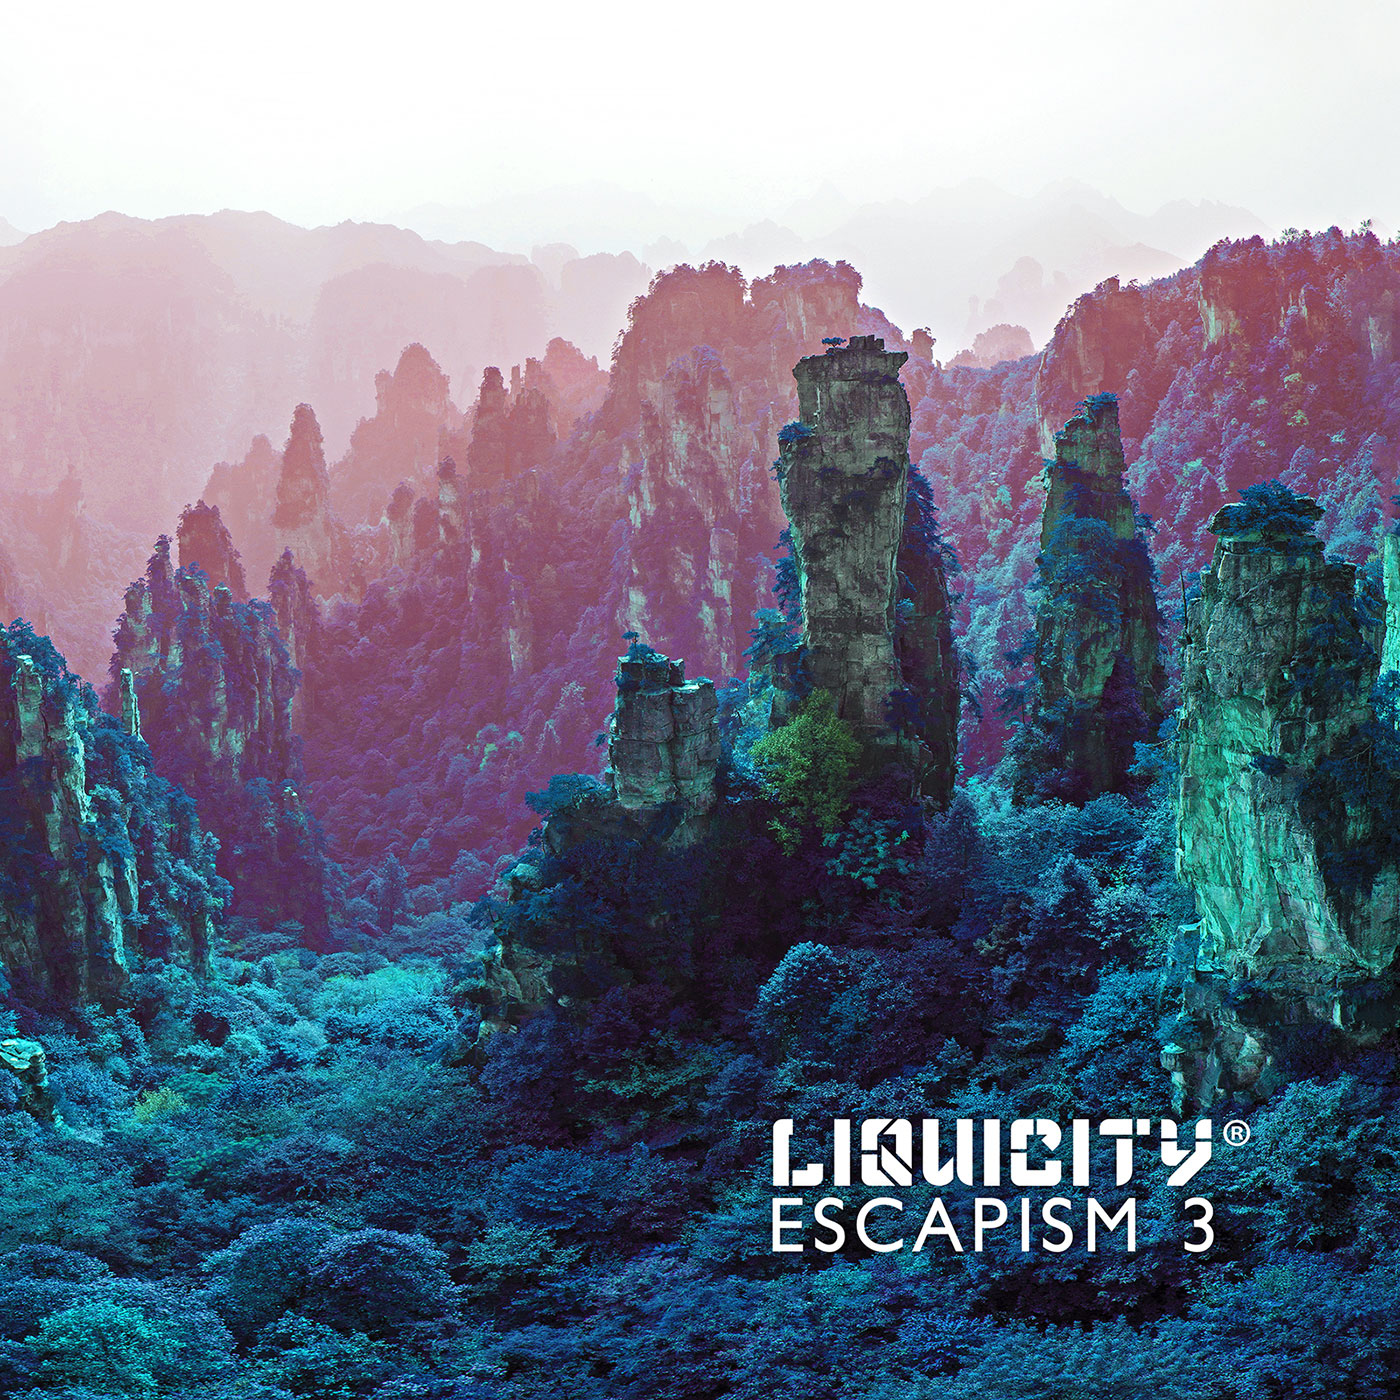 Liquicity